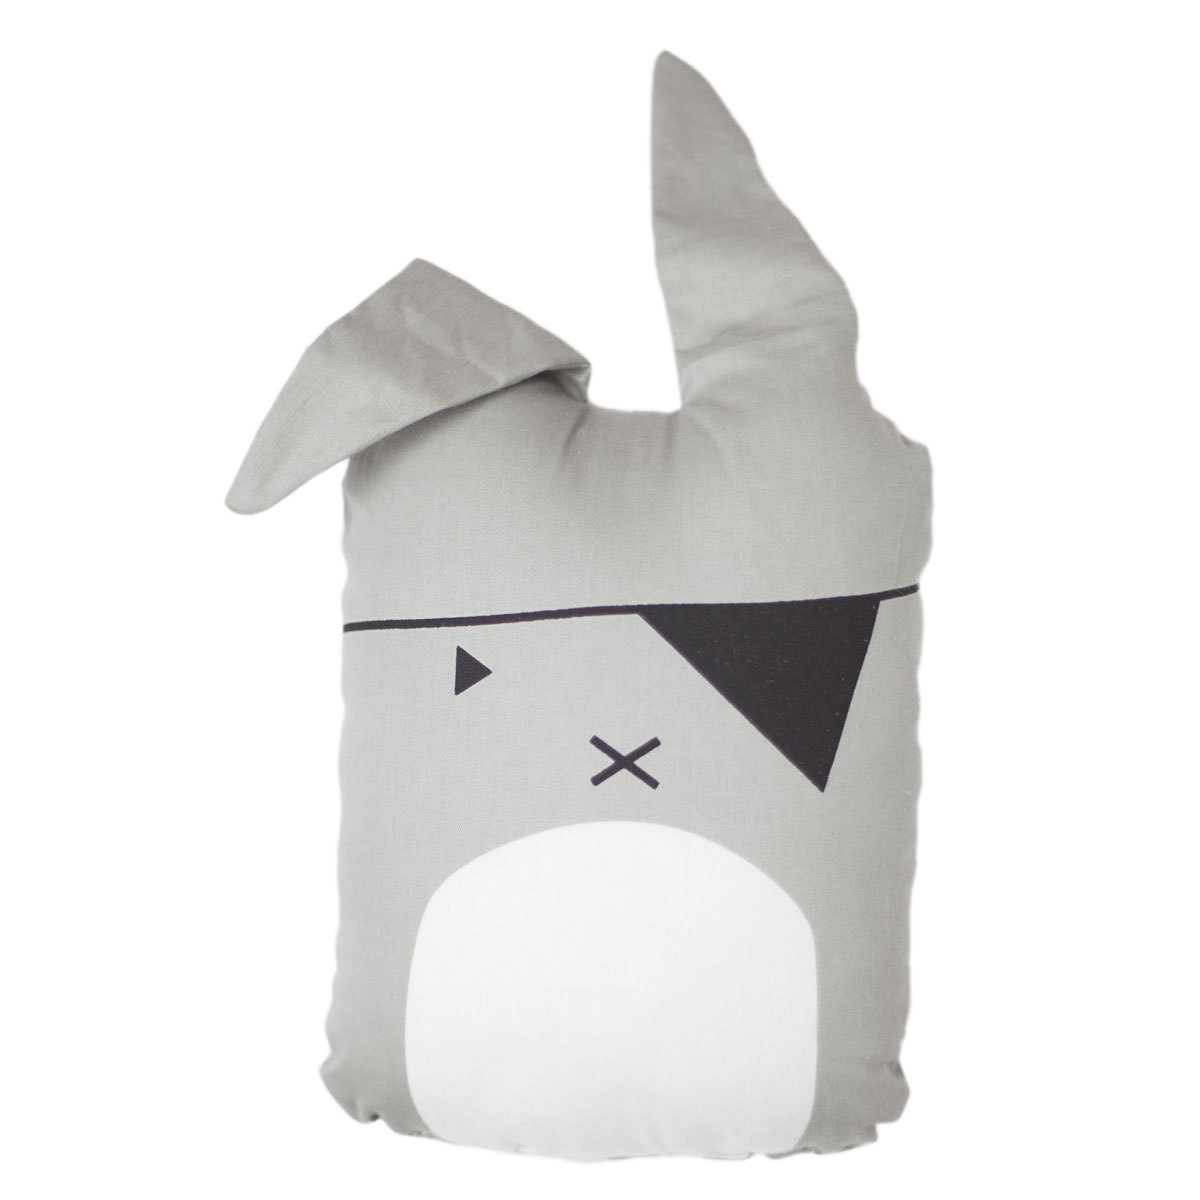 Coussin Coussin - Pirate Bunny Coussin - Pirate Bunny